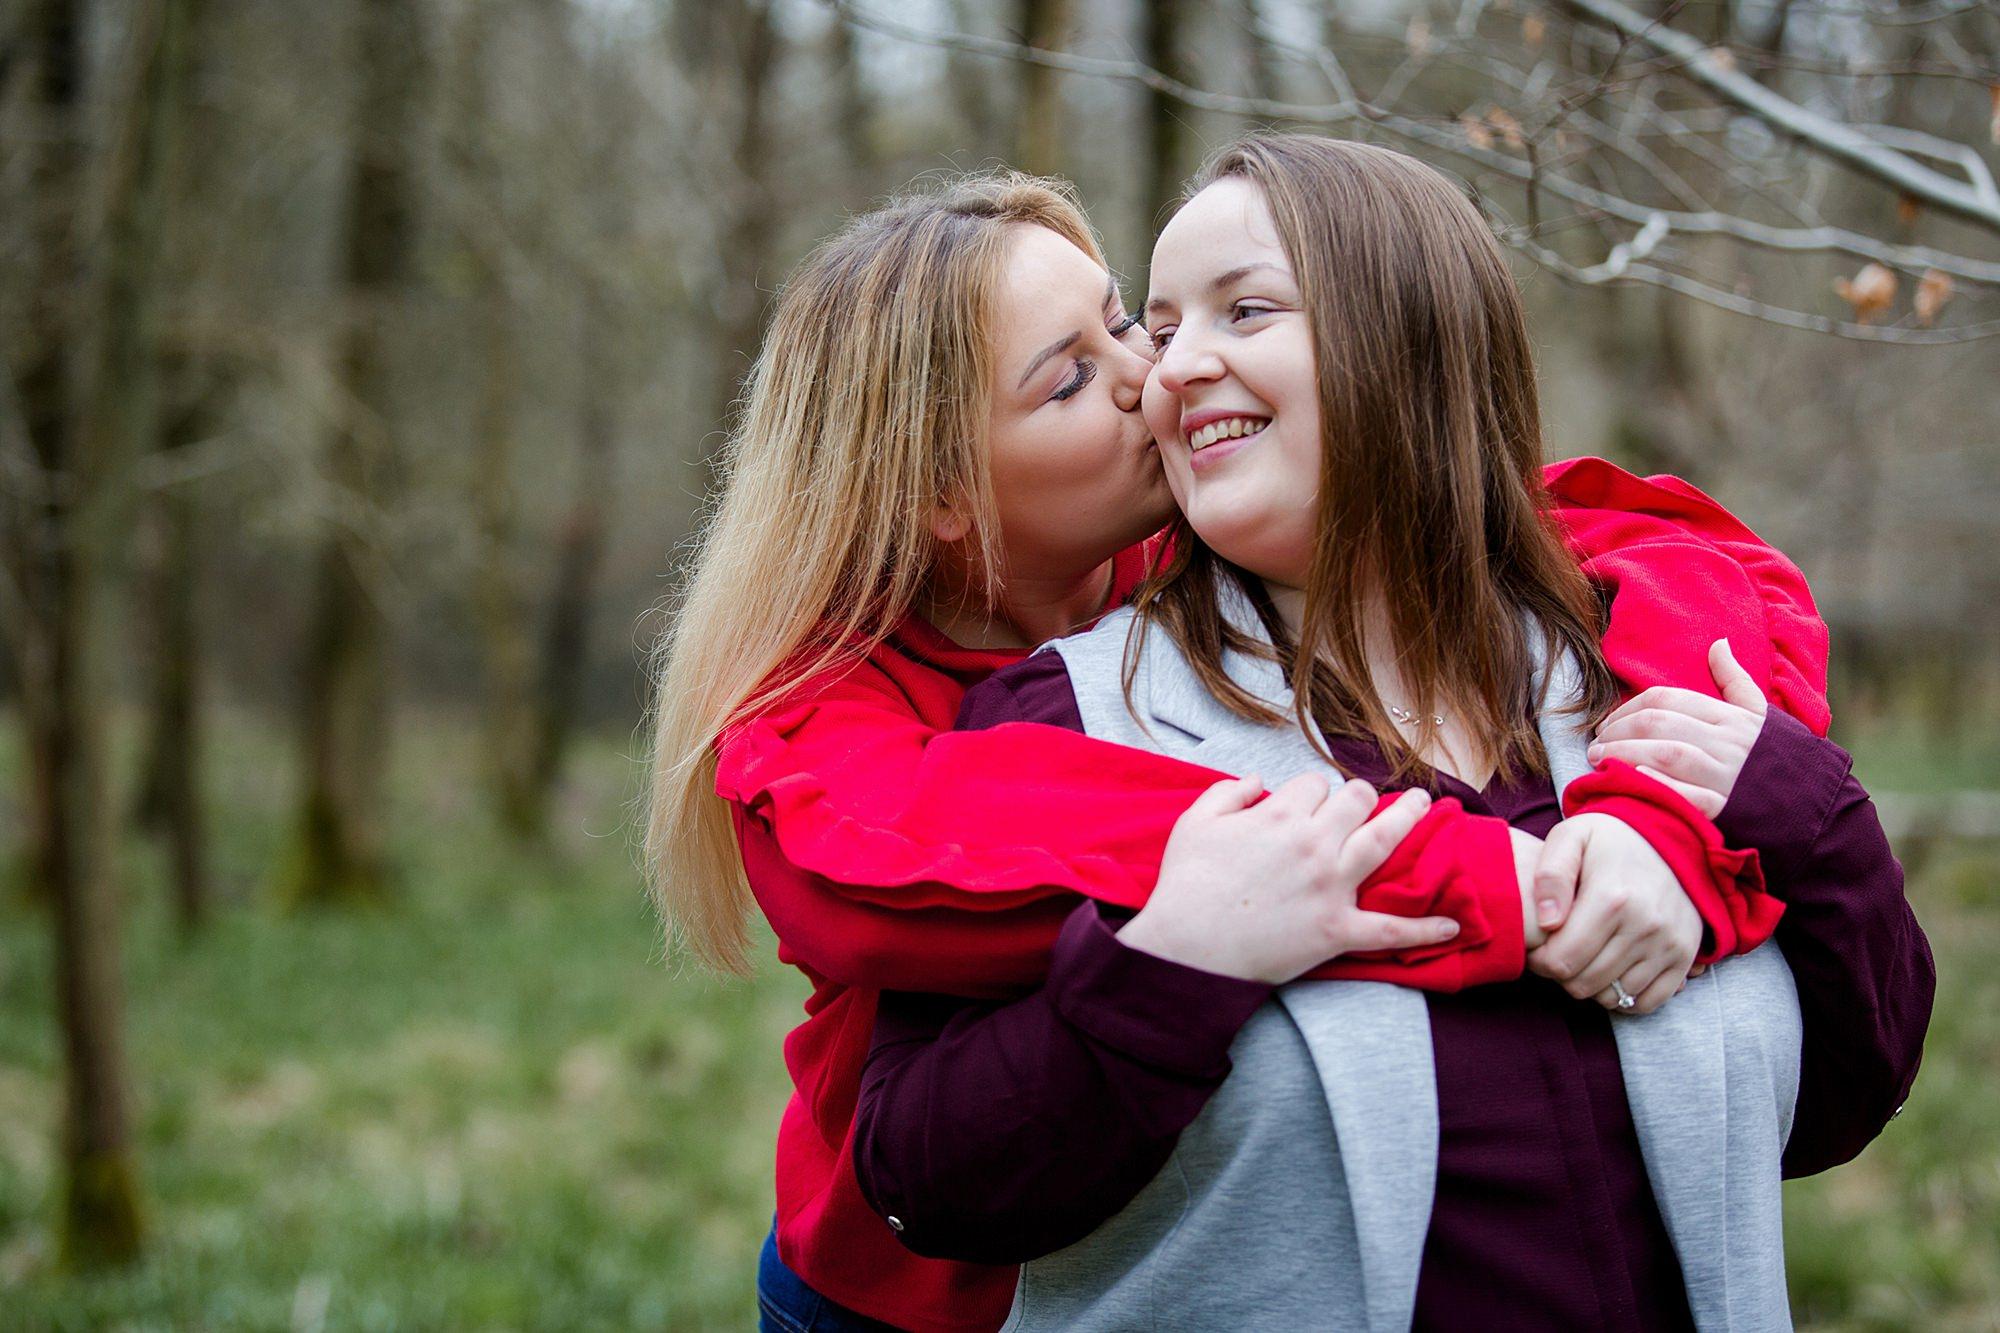 Ashridge park engagement shoot bride kisses her fiancee on cheek